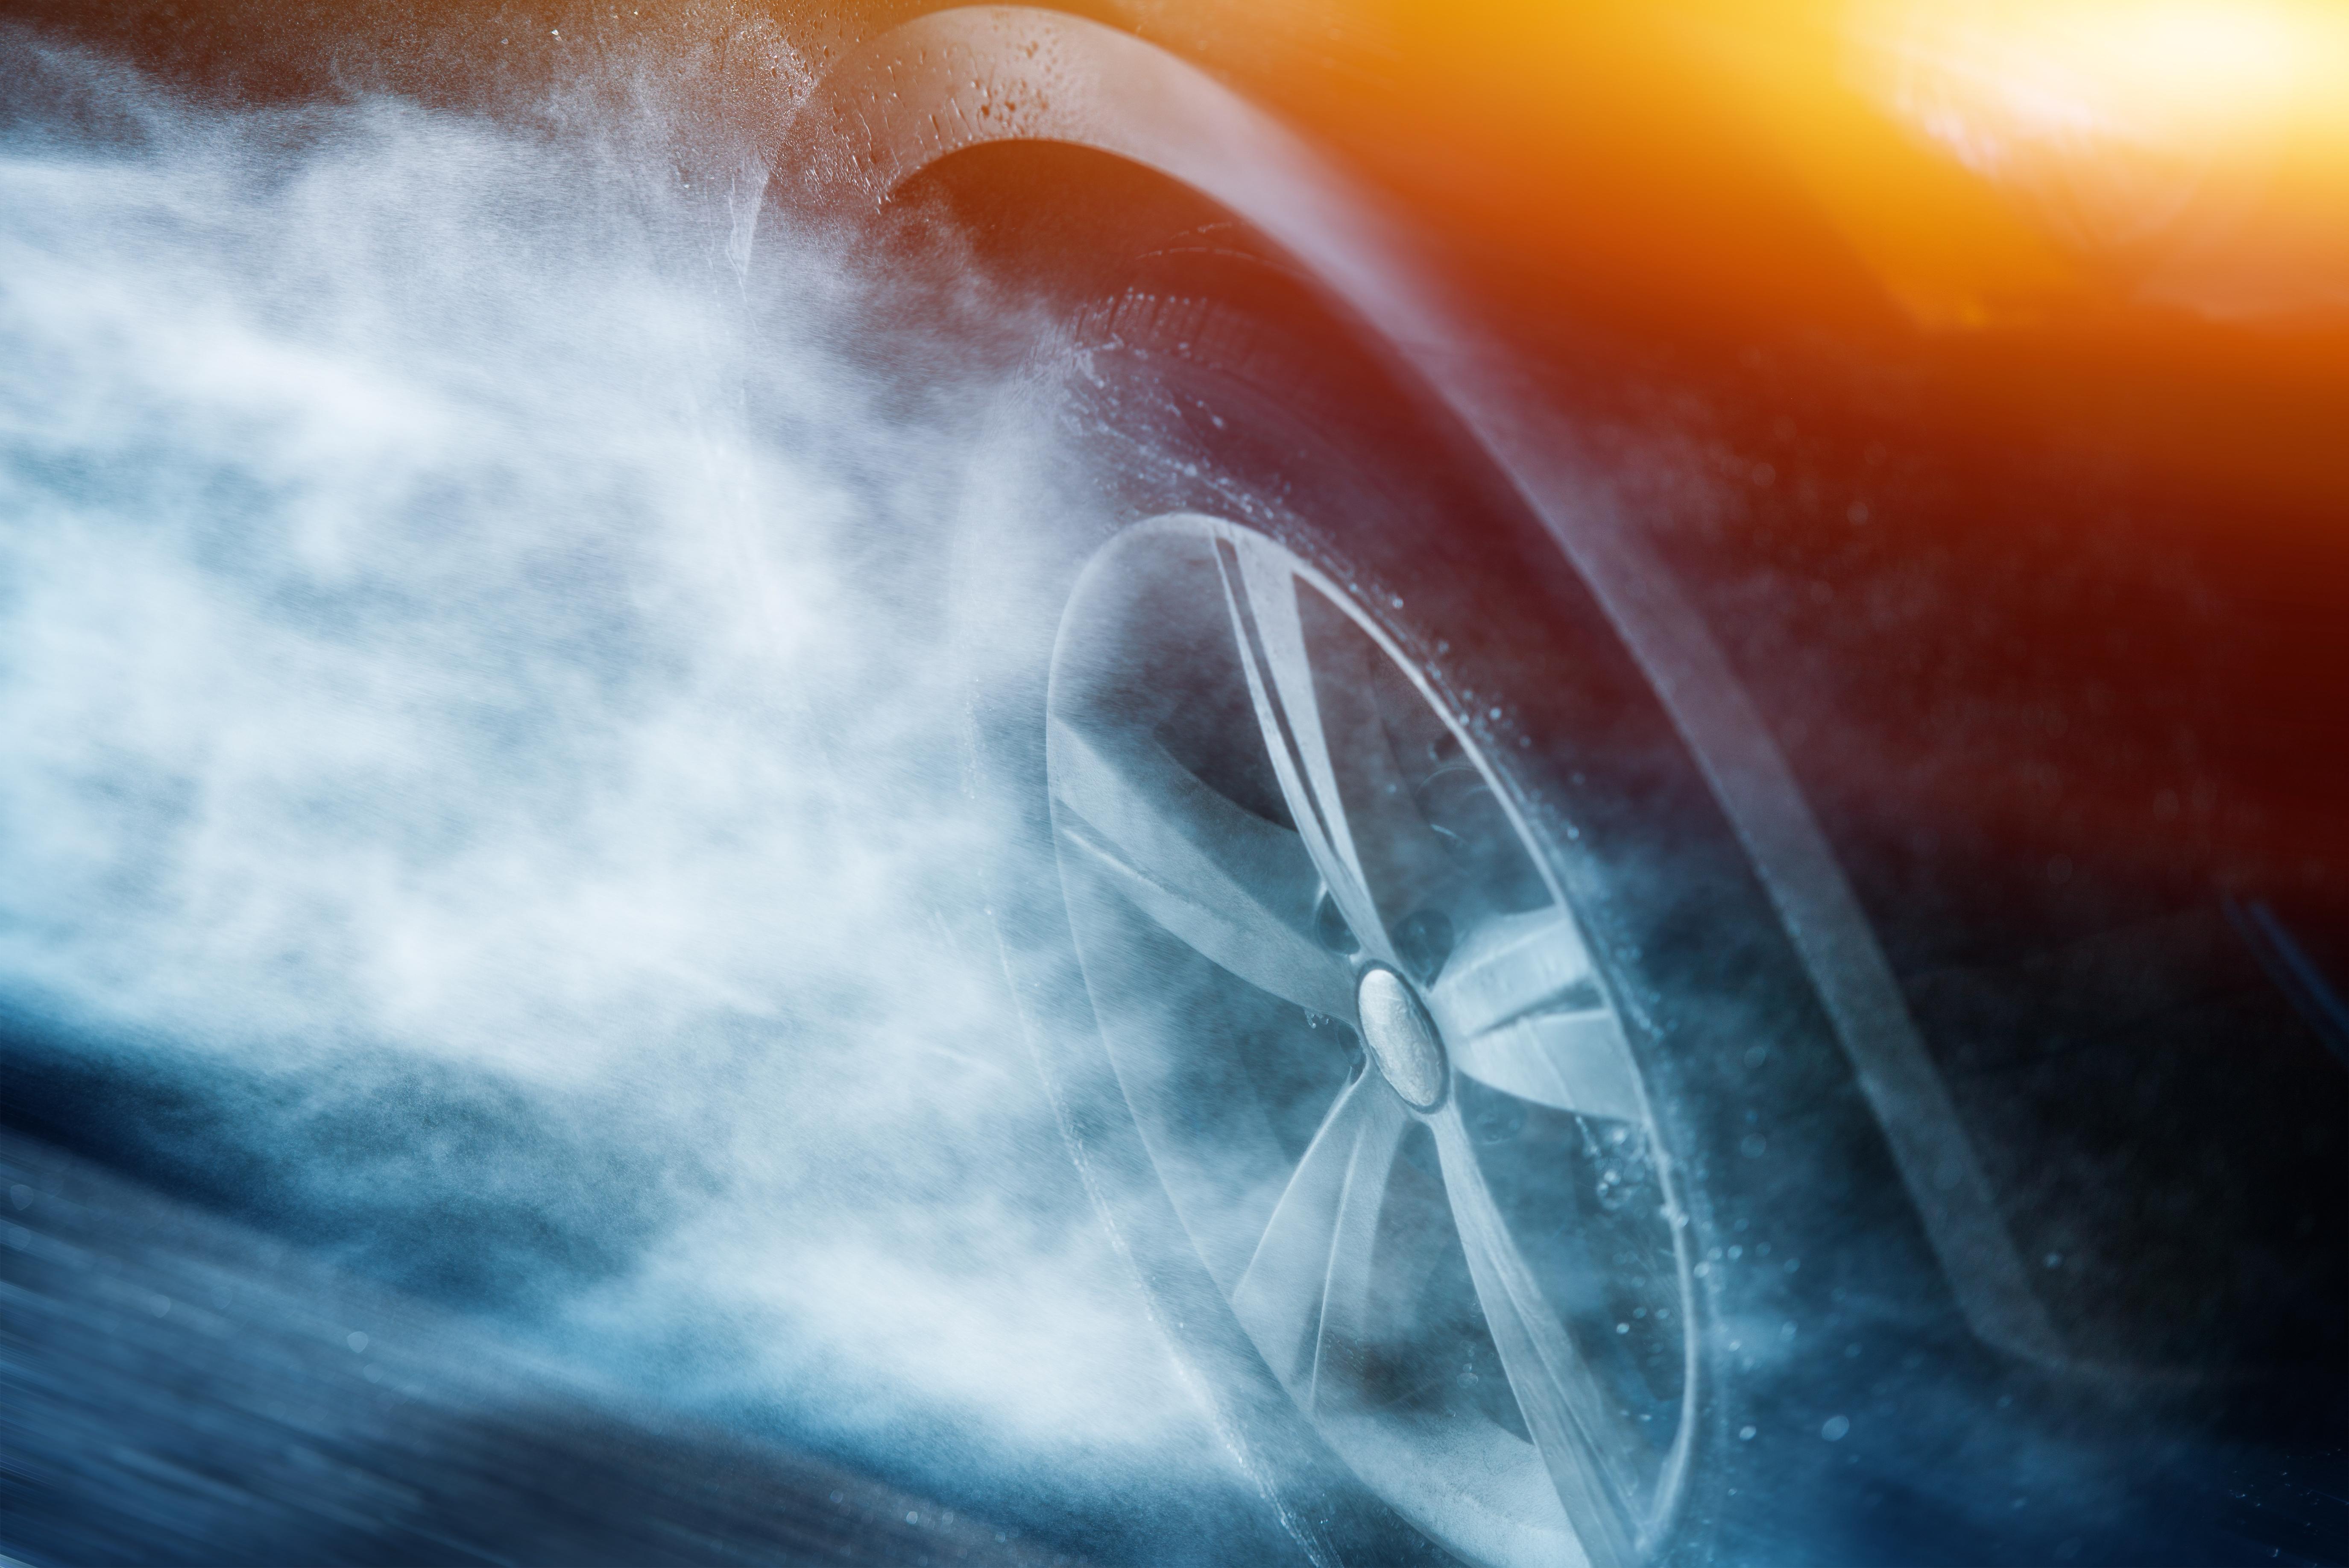 Close up of wheel of car in heavy rain